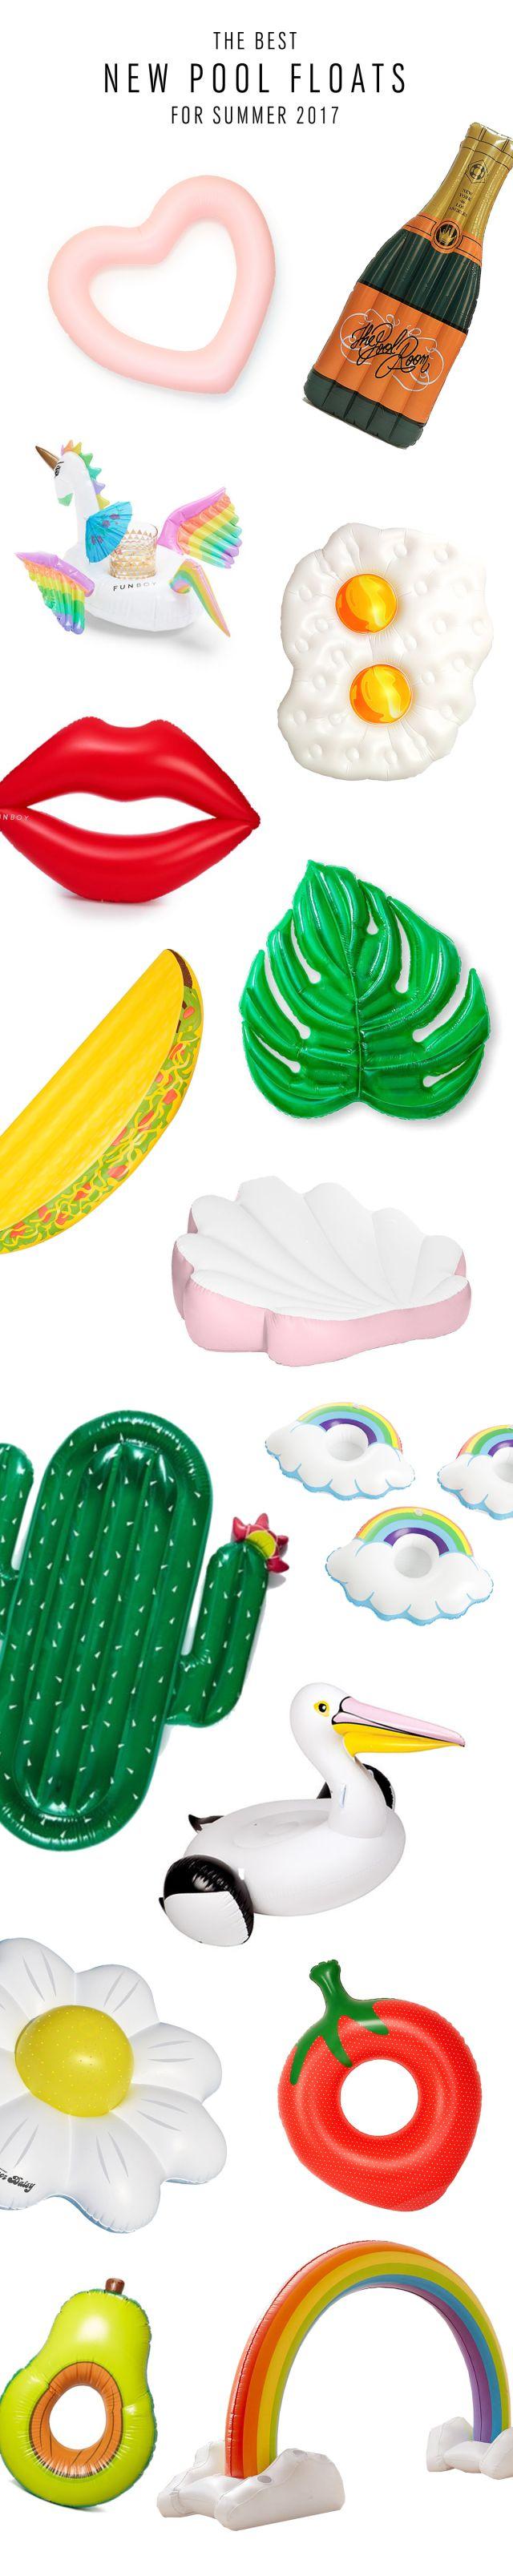 Pool floats for summer bridal shower or bachelorette party - bridal shower decor - bachelorette party ideas {Sugar & Cloth}